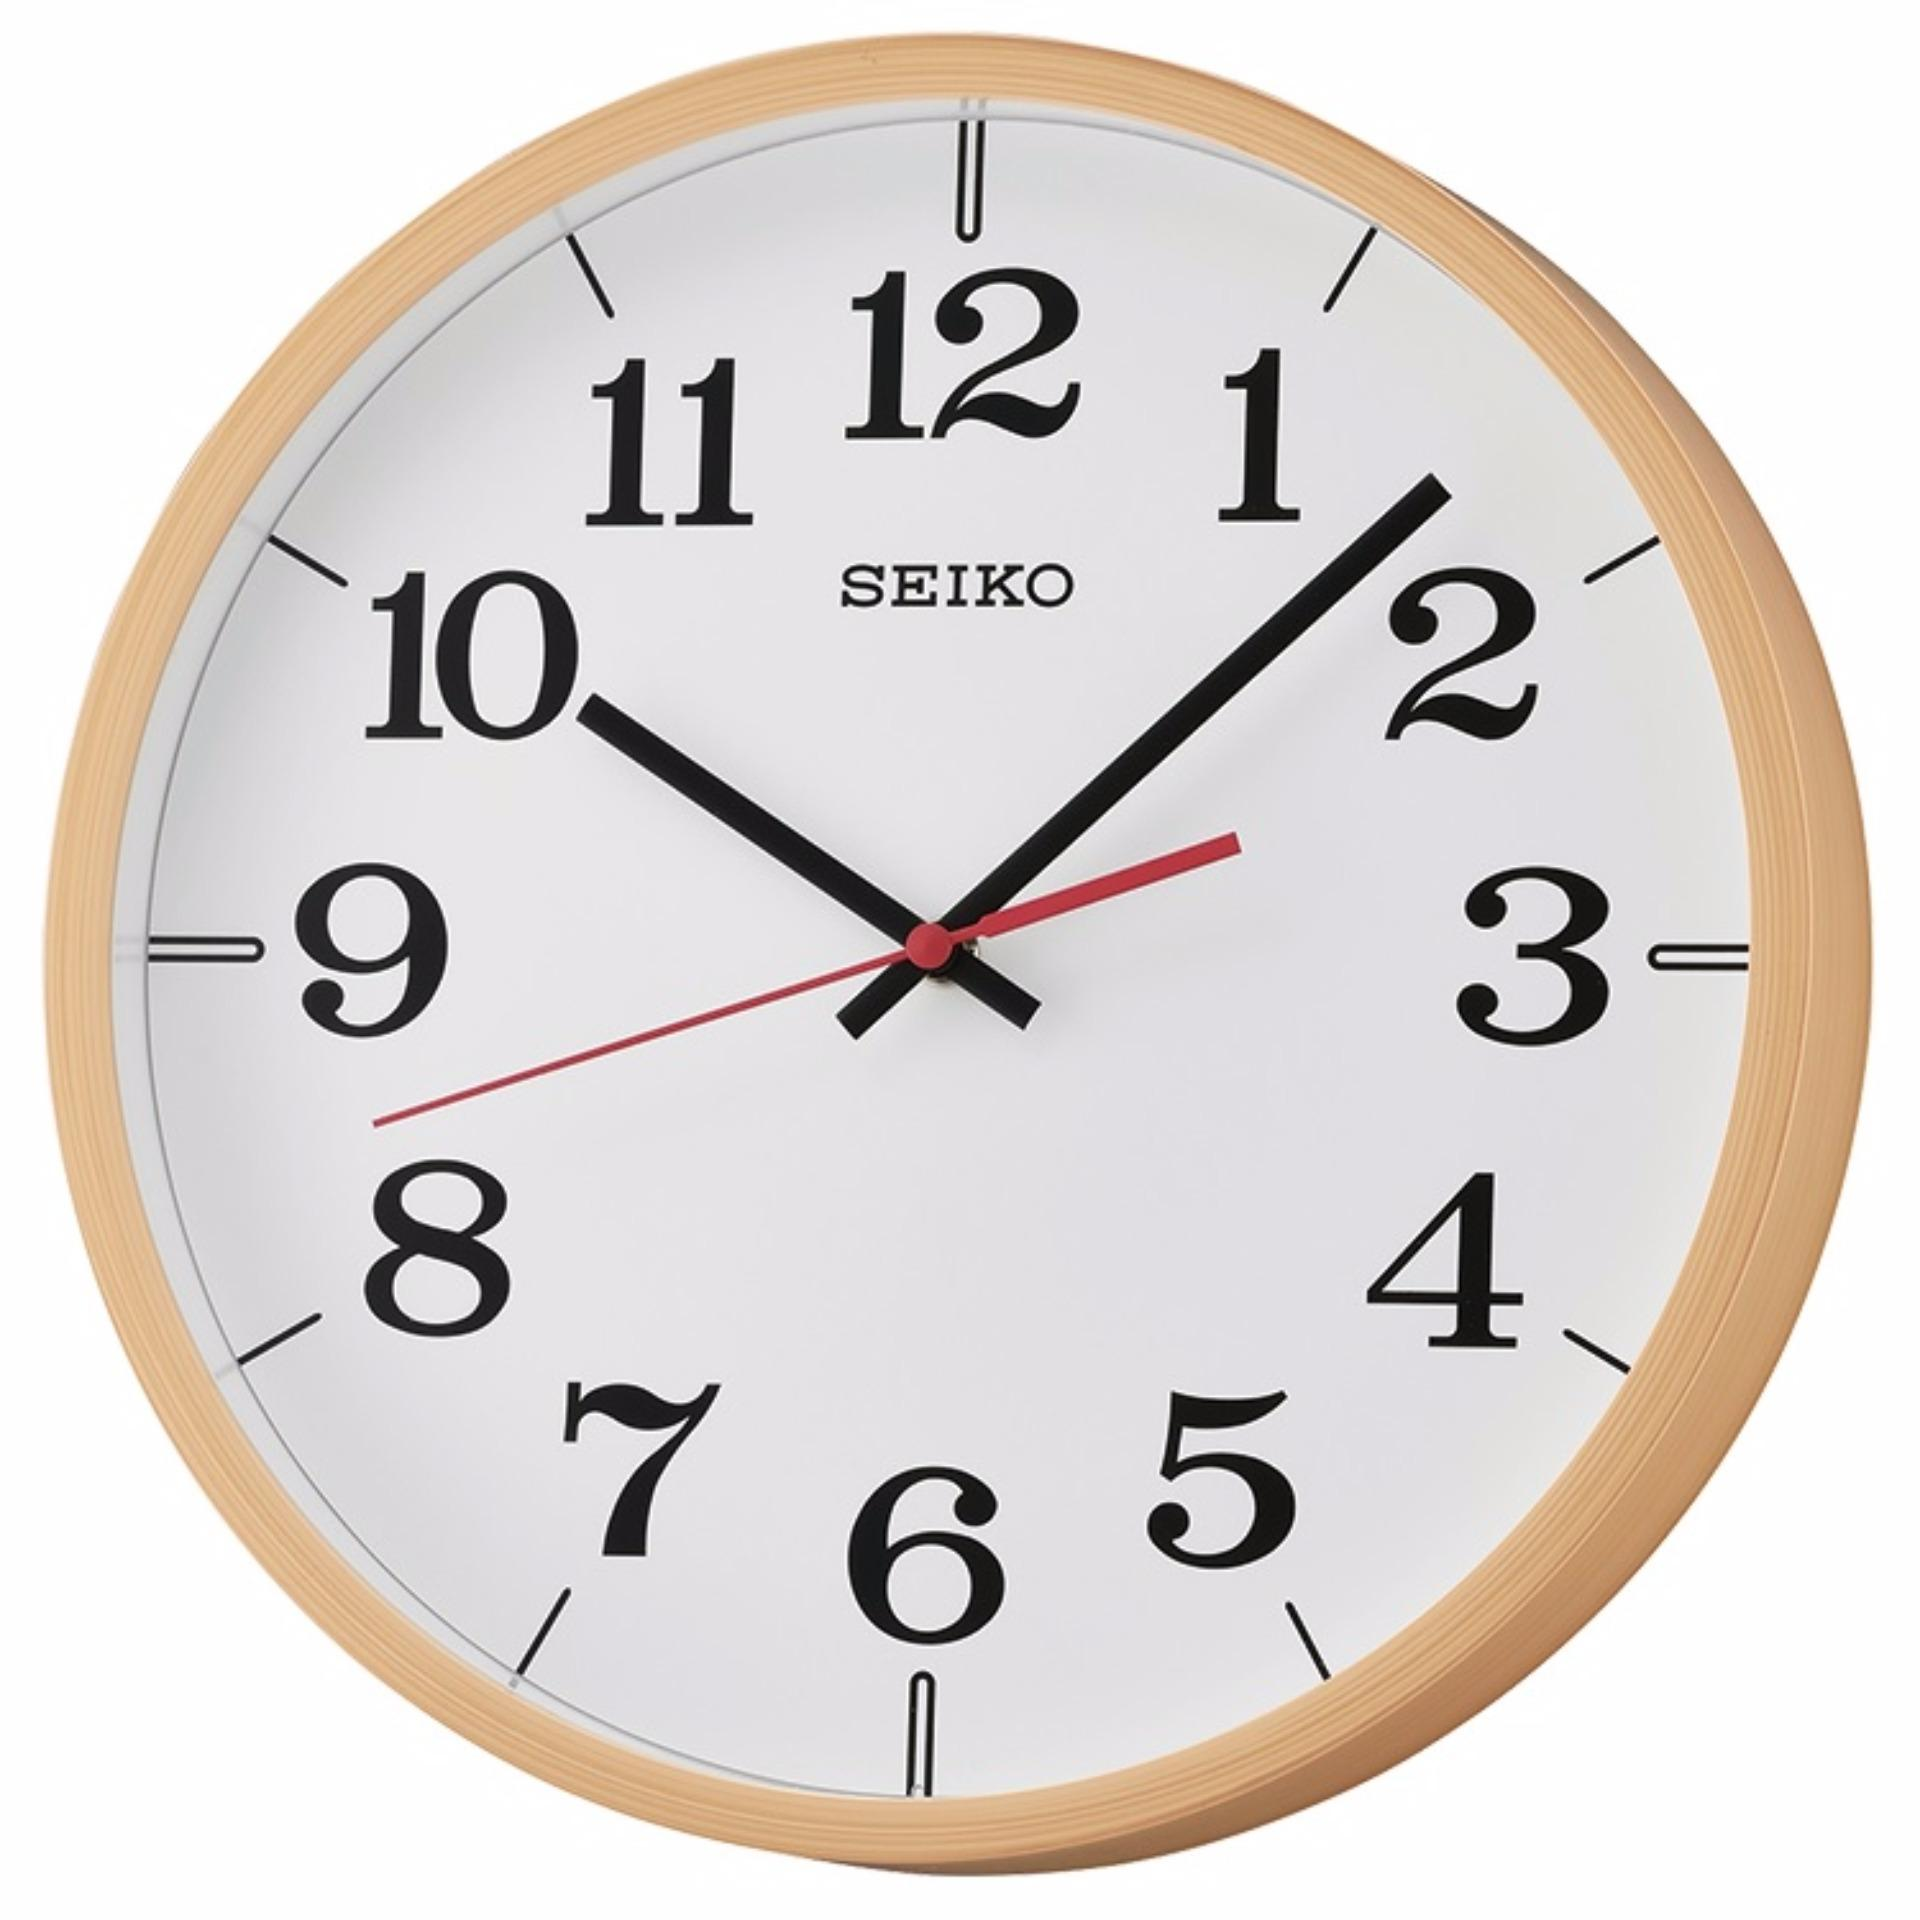 Seiko Qxa691a Analog Wall Clock Singapore